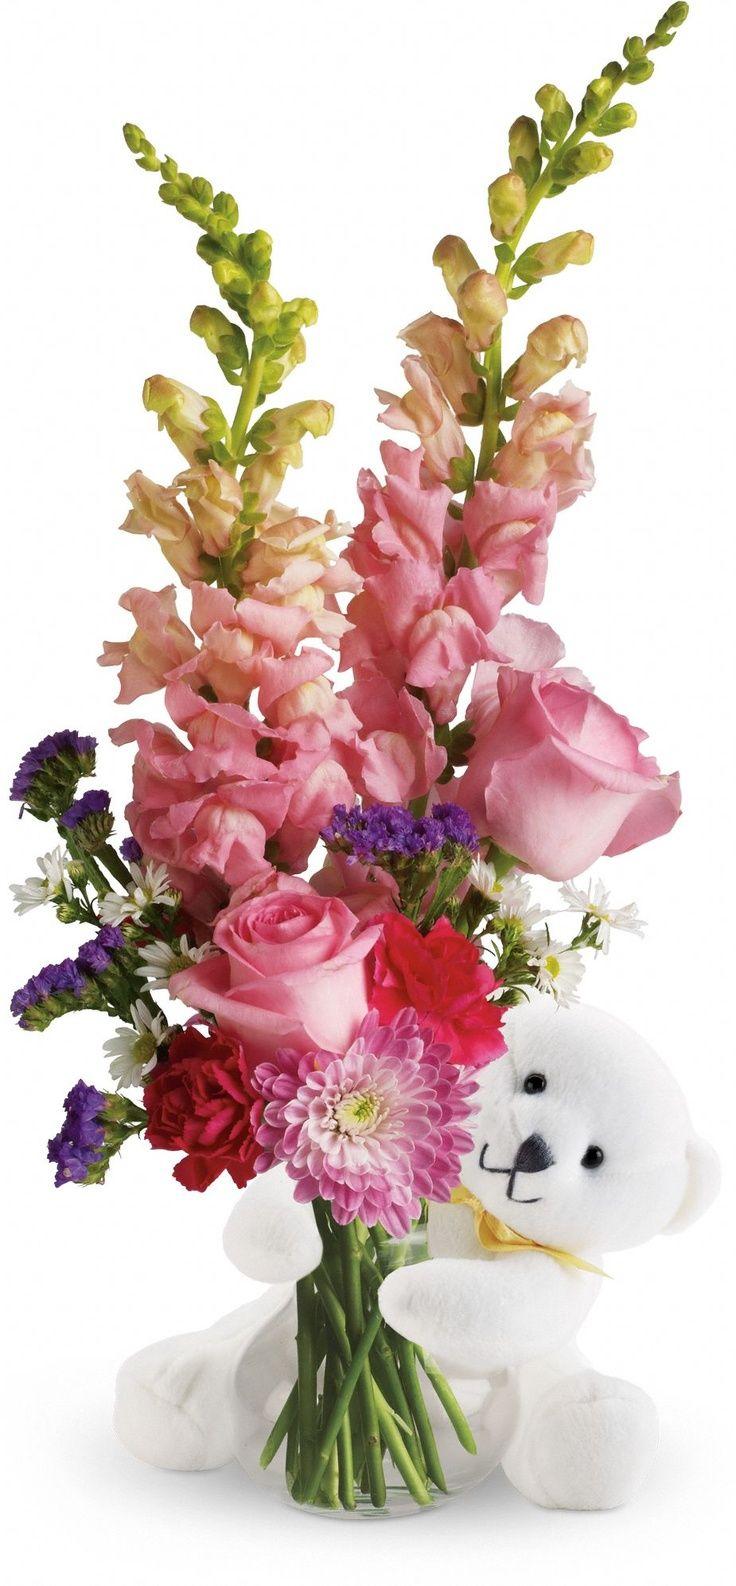 Send diwali flowers online send diwali flowers online pinterest send diwali flowers online birthday flower delivery order flowers send flowers online fresh izmirmasajfo